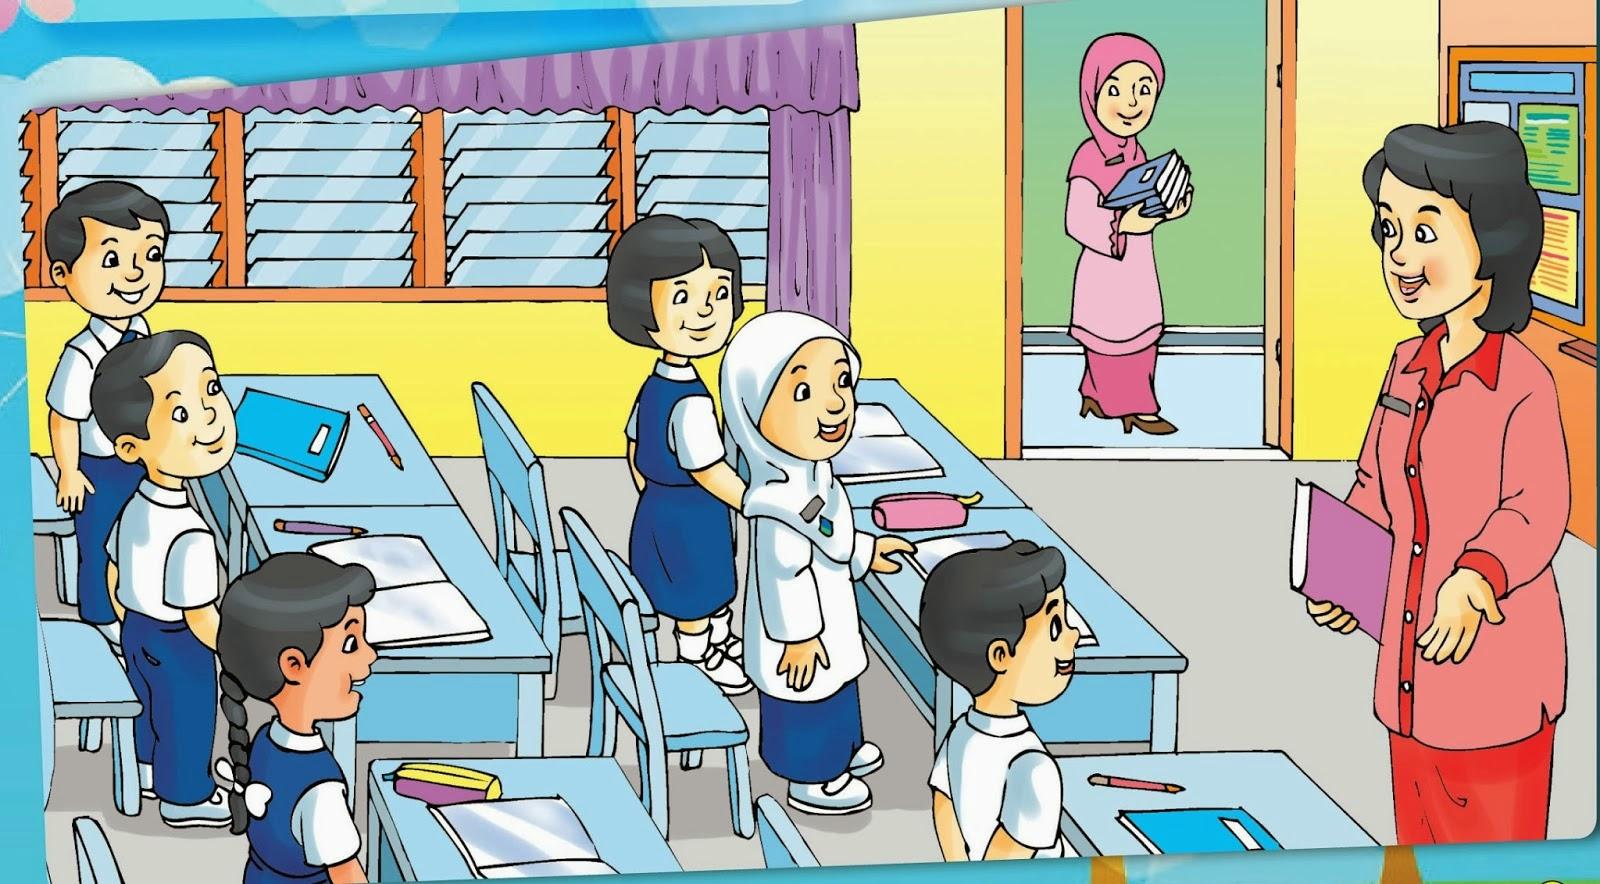 Mirzan Blog S 20 Koleski Terbaru Gambar Kartun Guru Sedang Mengajar Di Kelas Murid Datang Terlambat